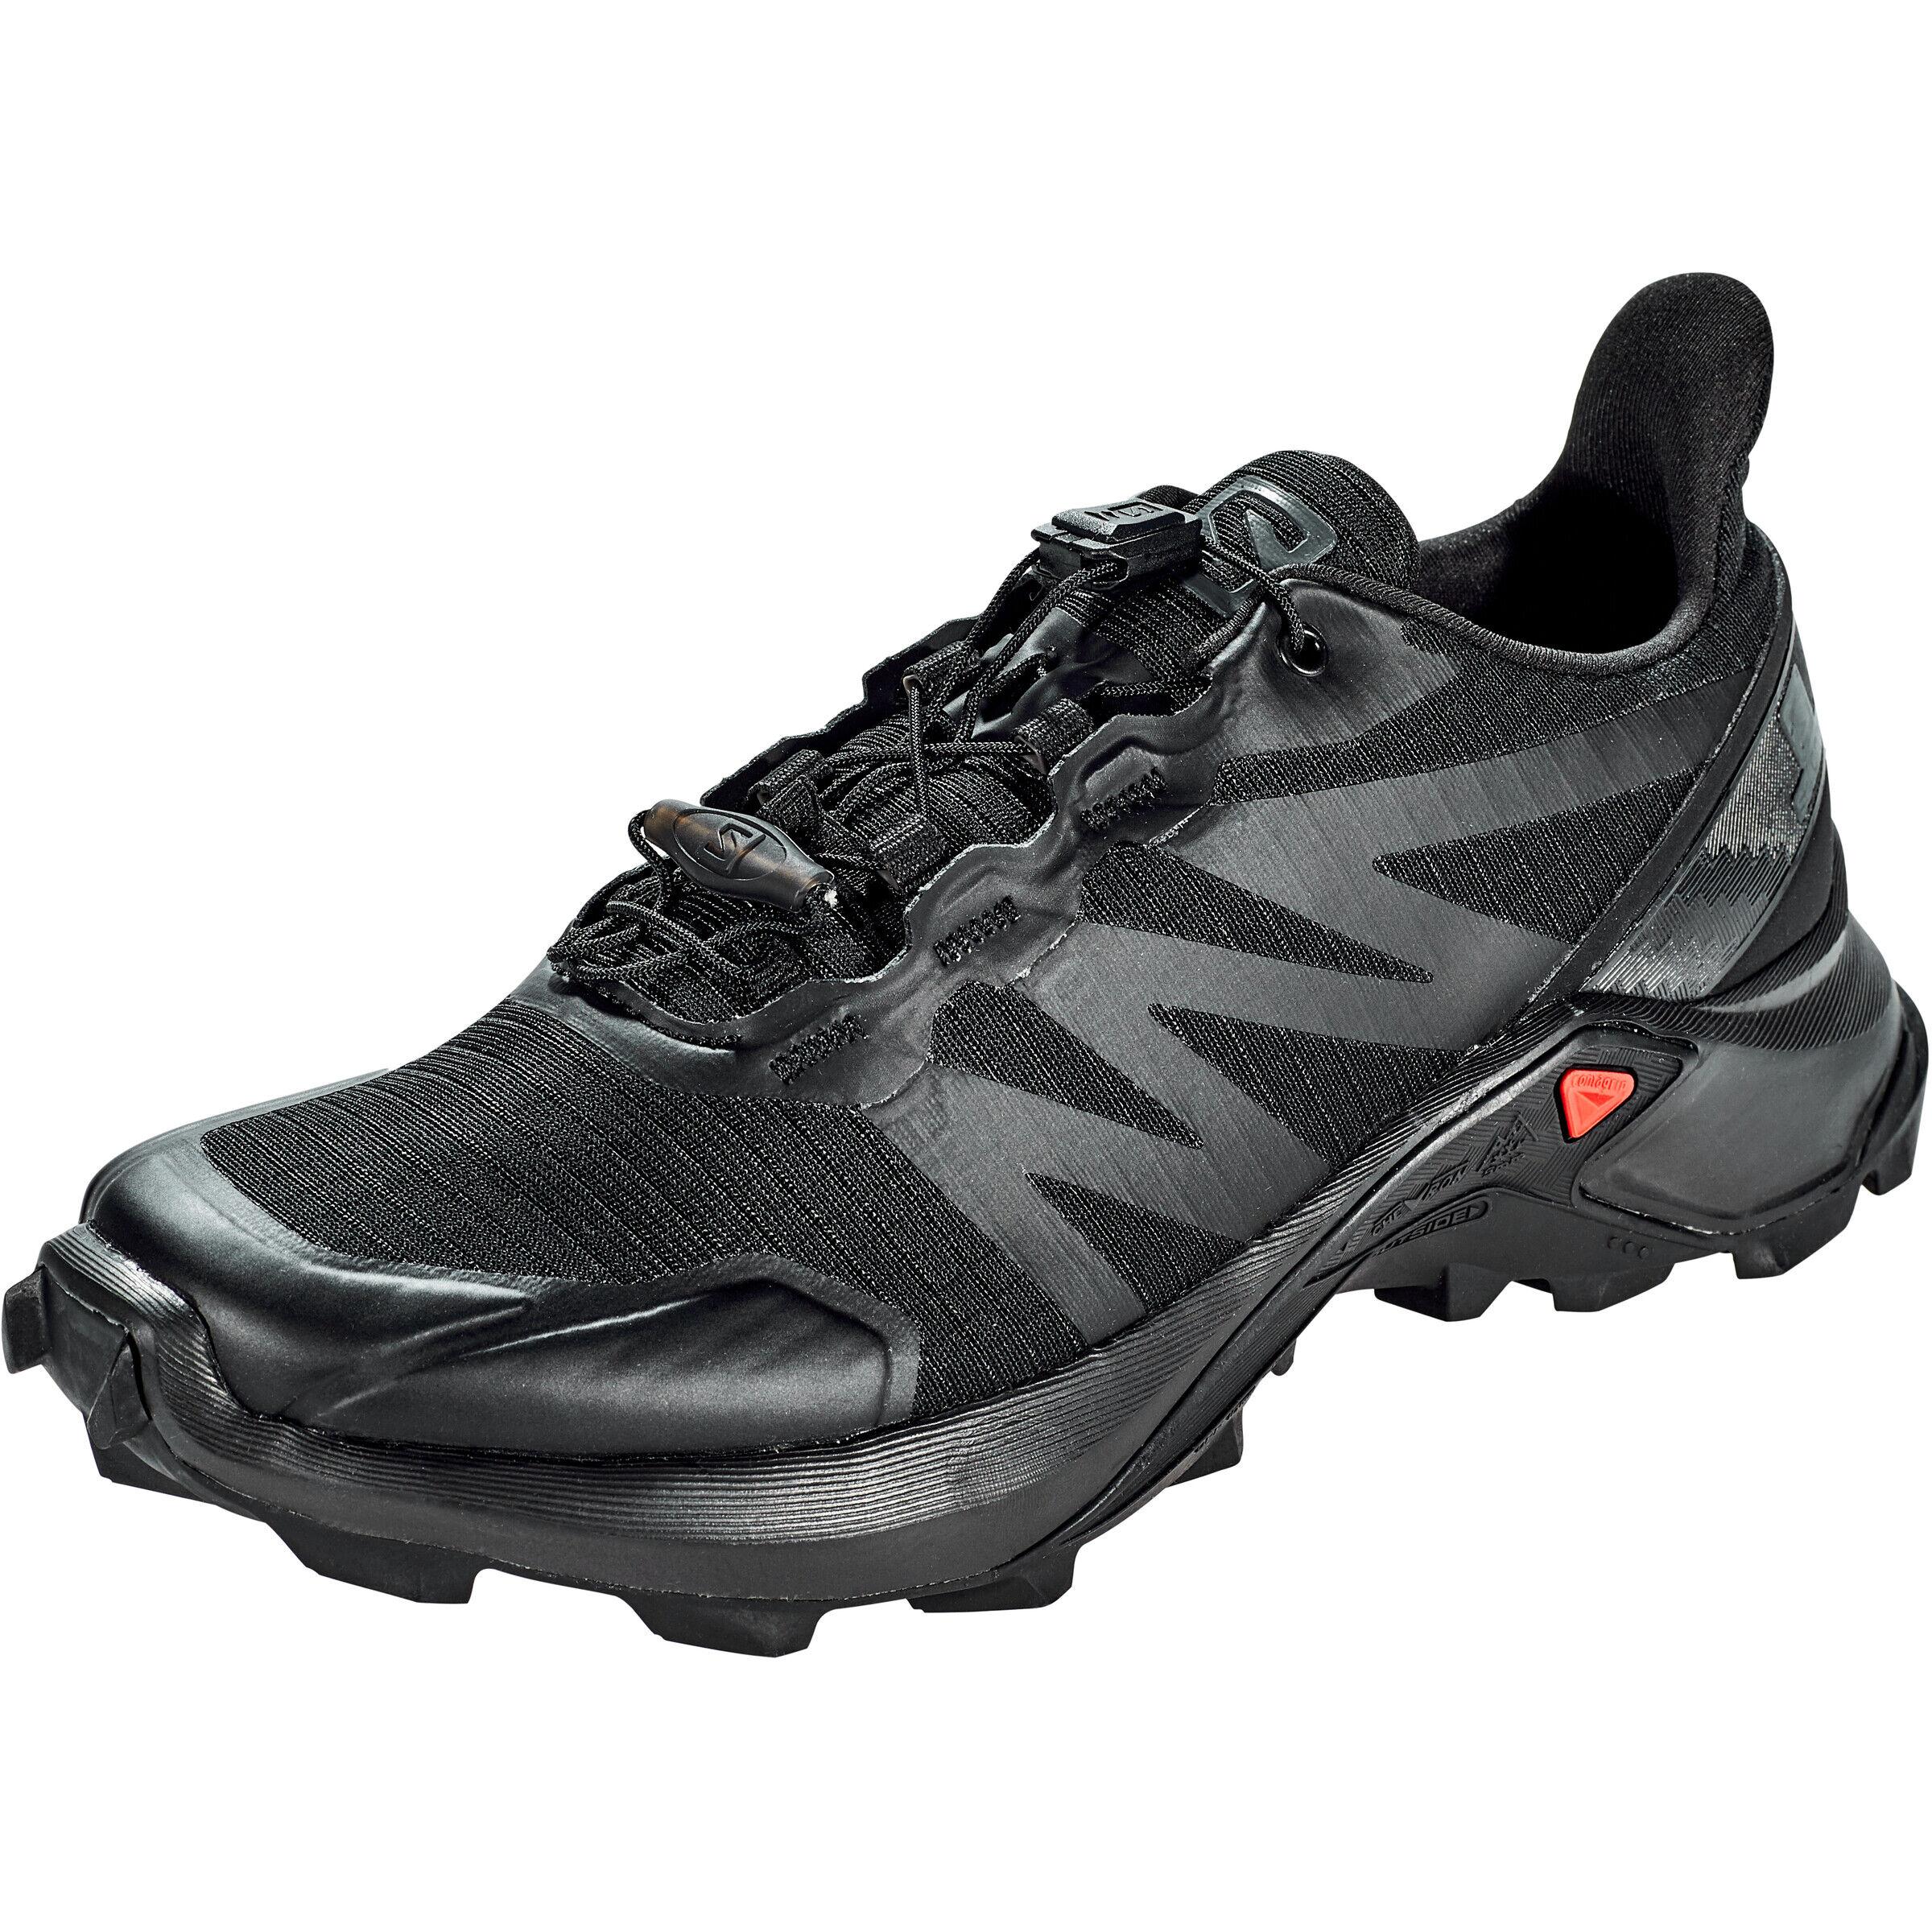 Salomon Supercross Schuhe Damen blackblackblack